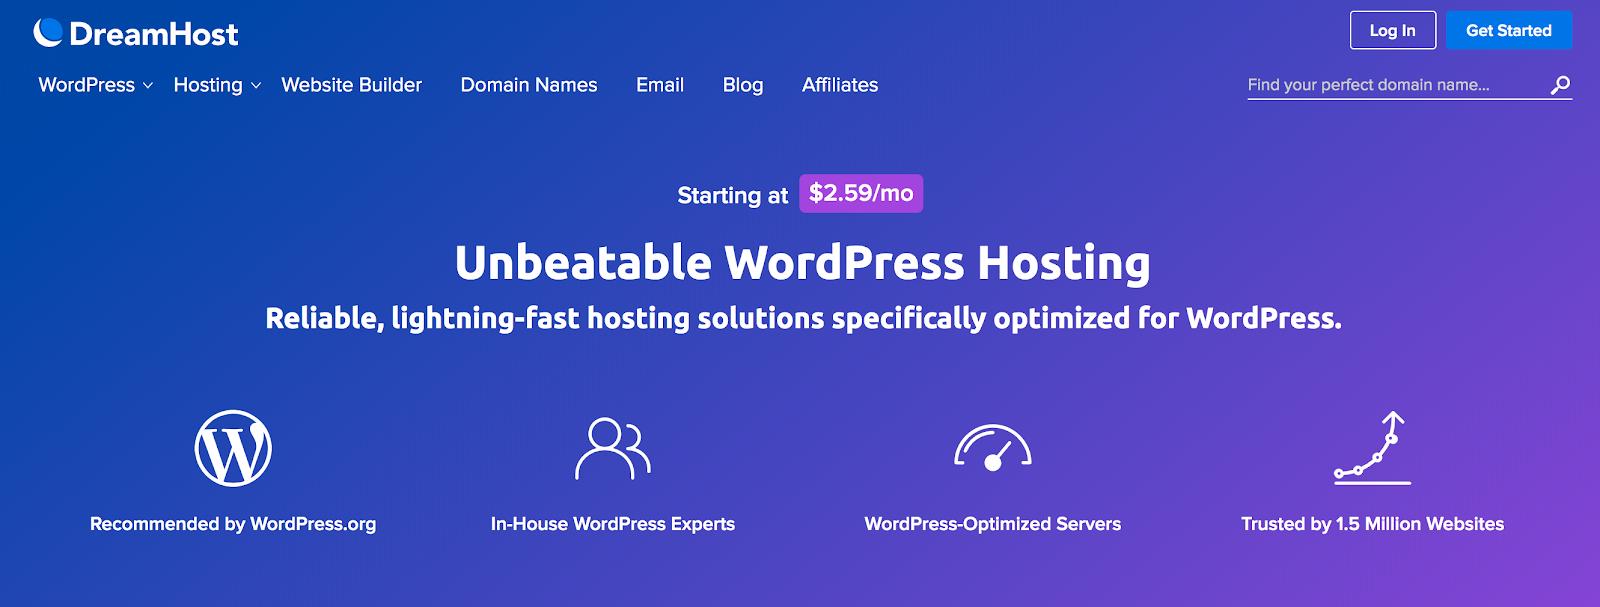 WordPress hosting at DreamHost.